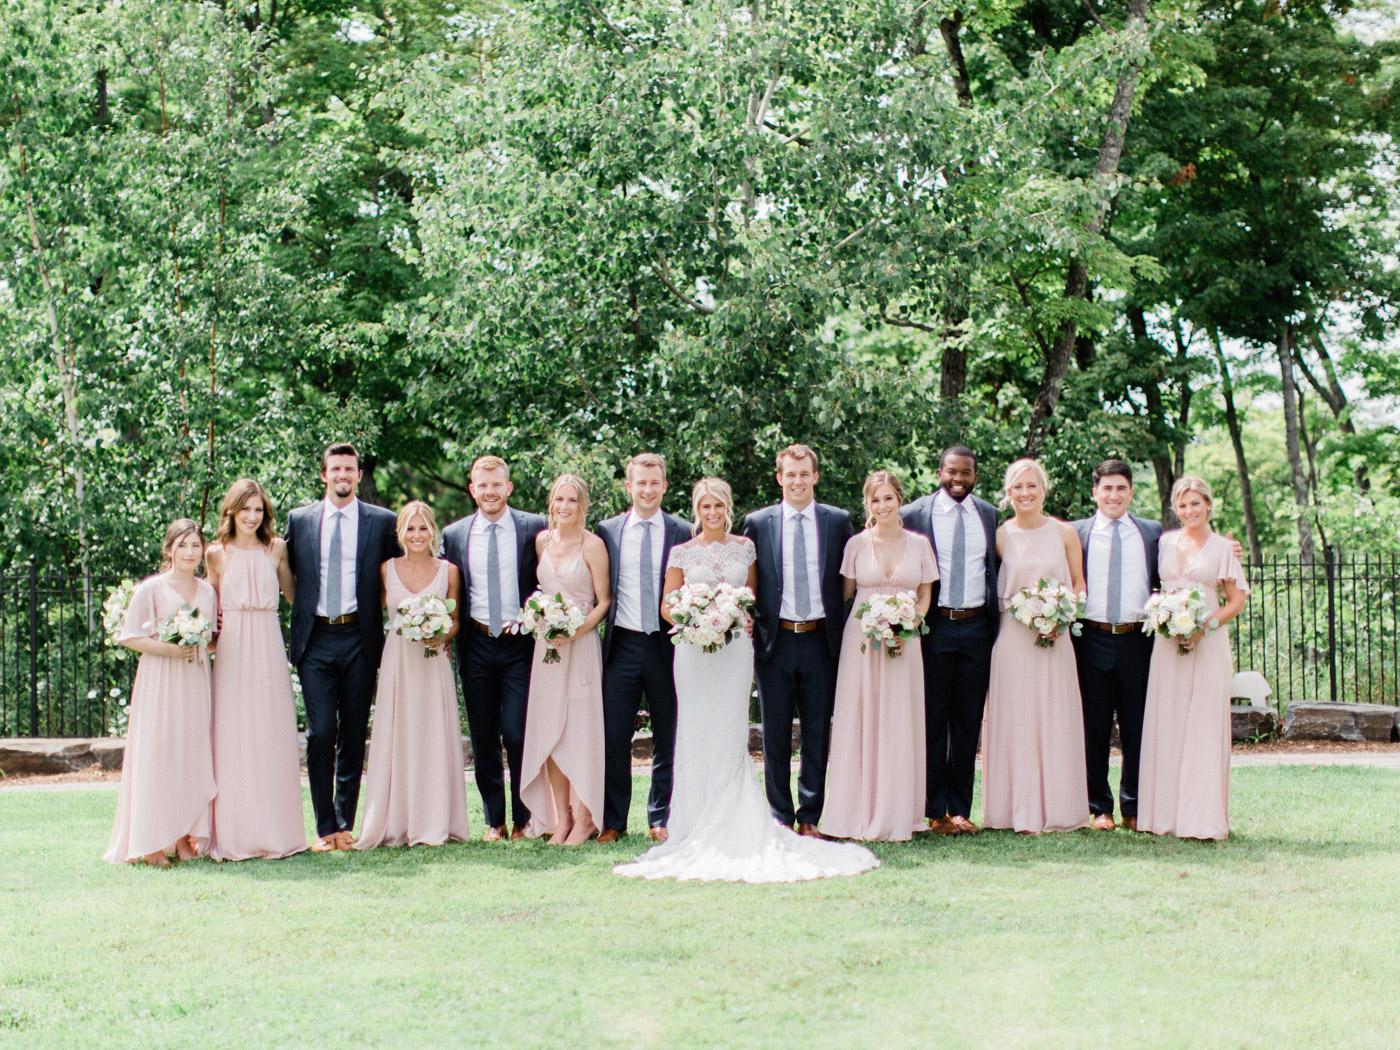 Toronto-Muskoka-wedding-photographer-summery-fun-documentary-the-marriott-rosseau45.jpg